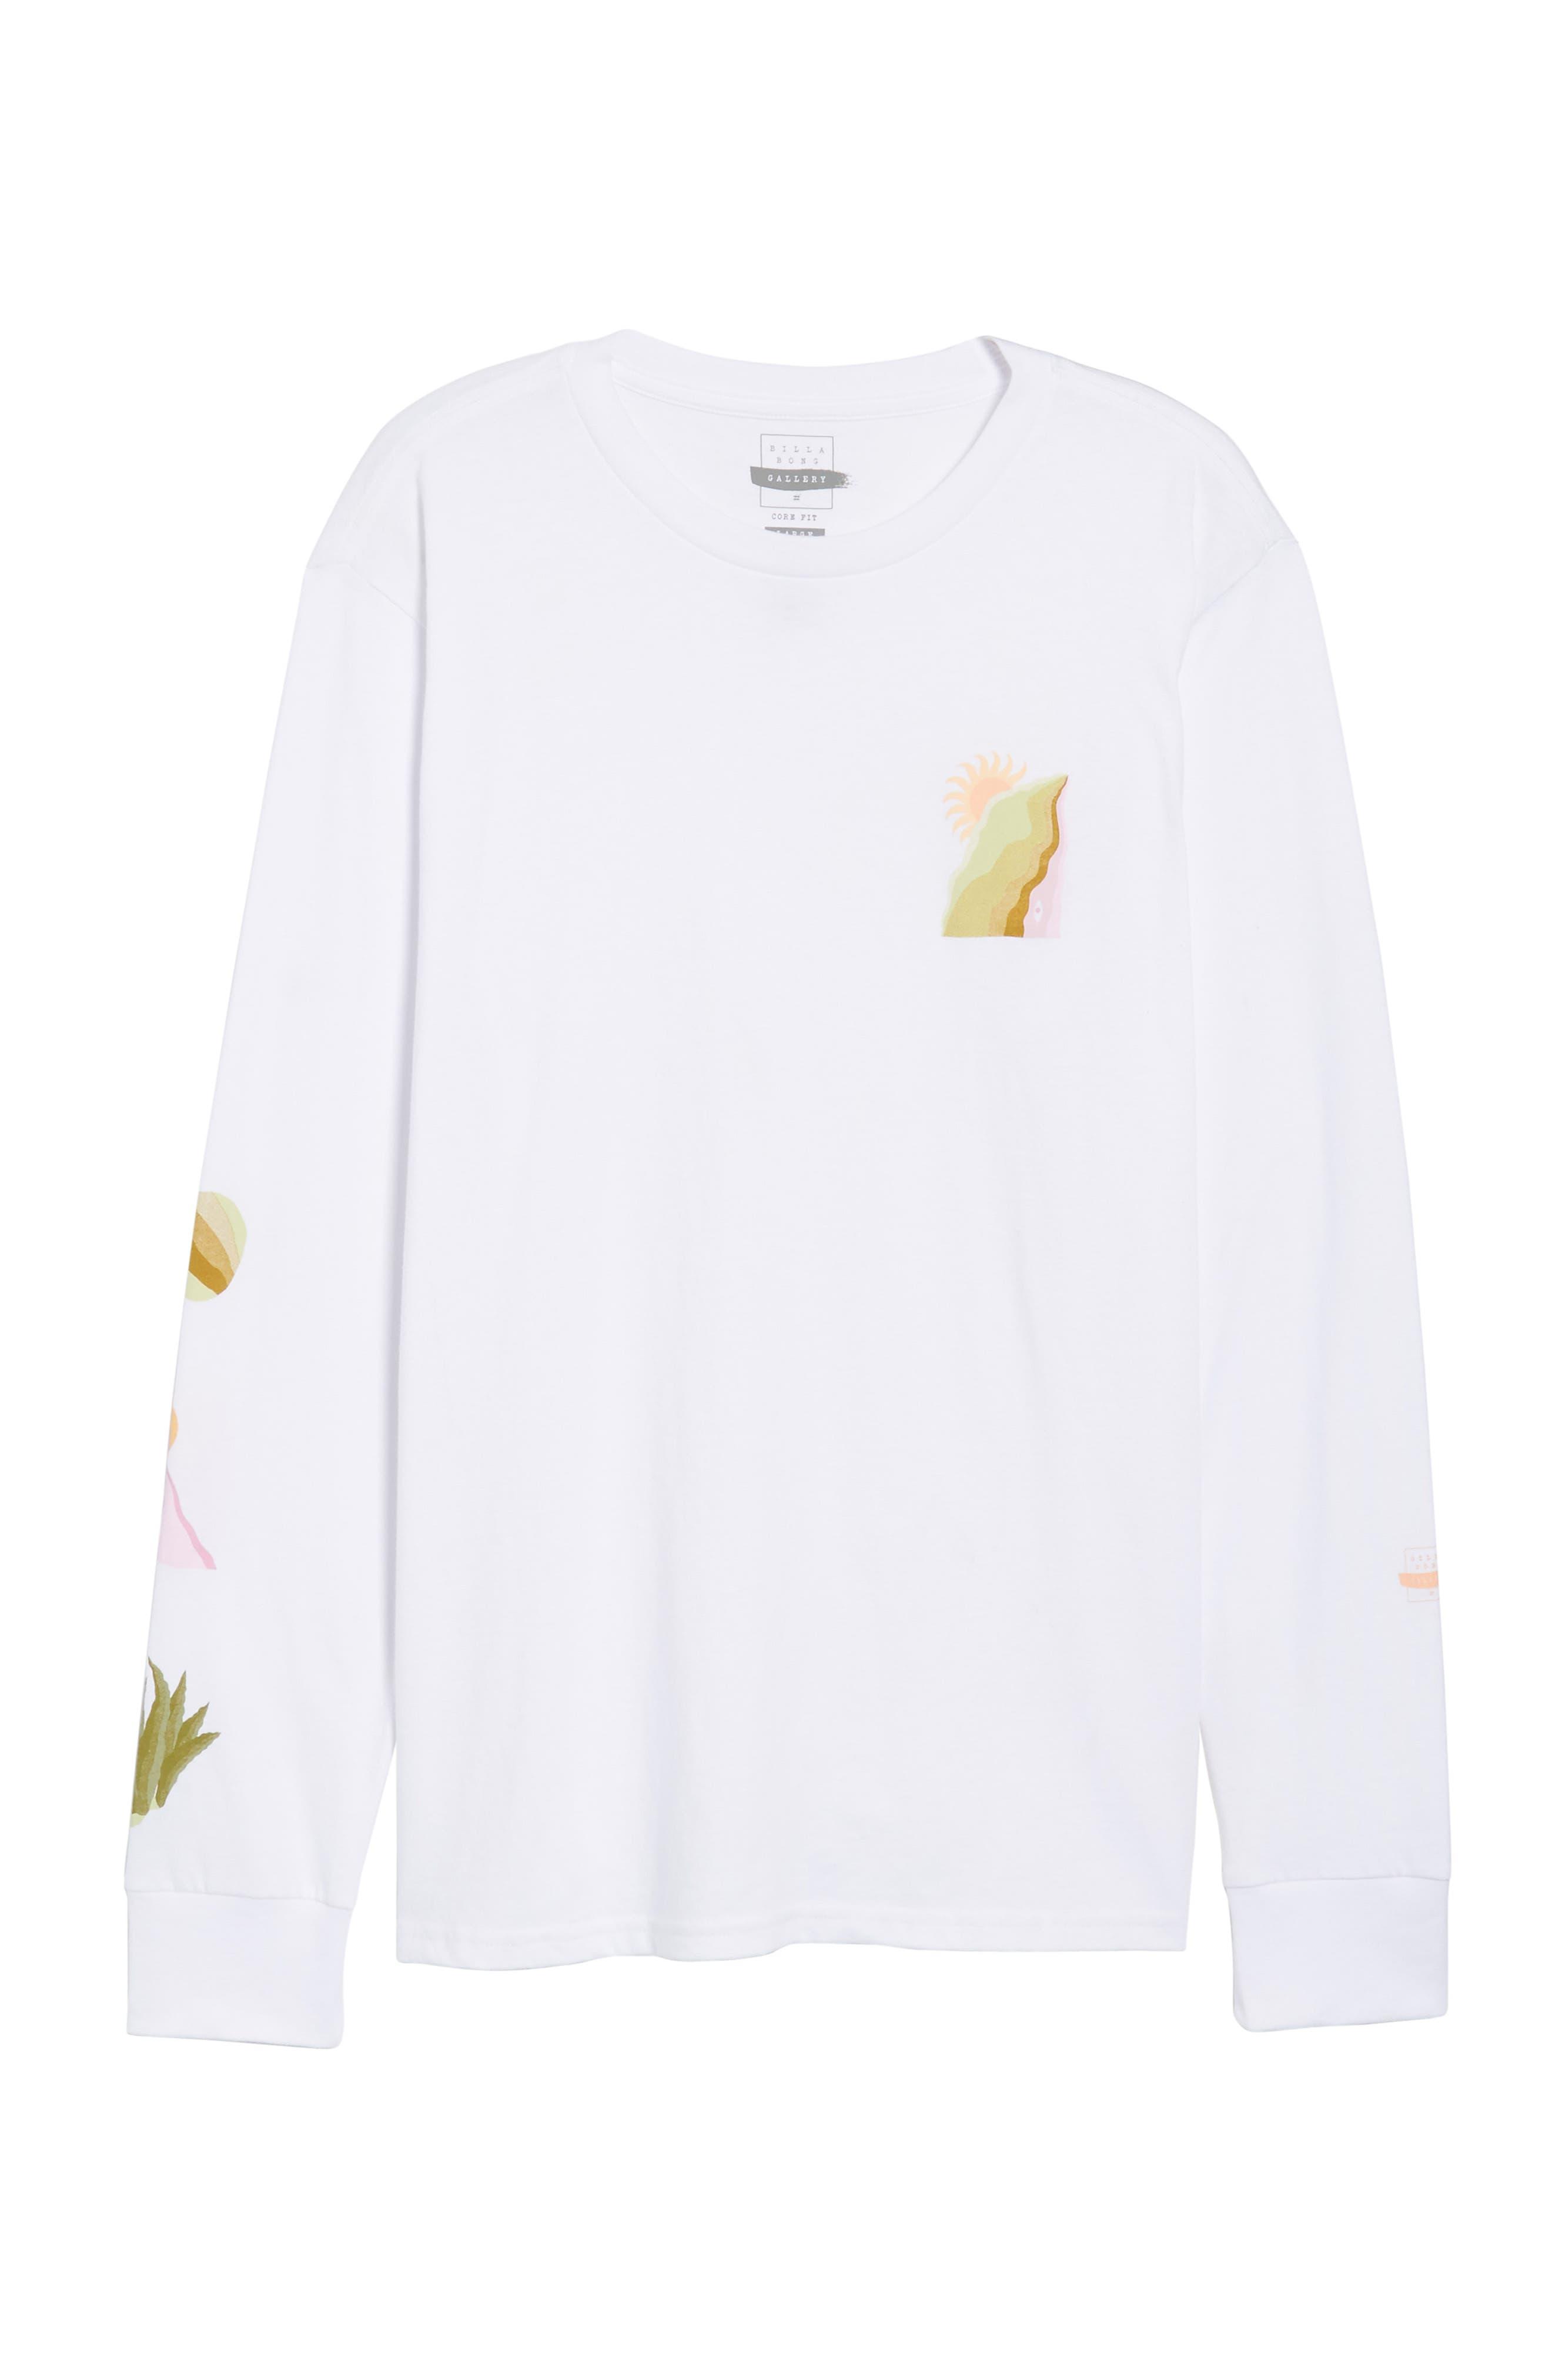 Wandering Eye Embroidered Long Sleeve T-Shirt,                             Alternate thumbnail 6, color,                             White